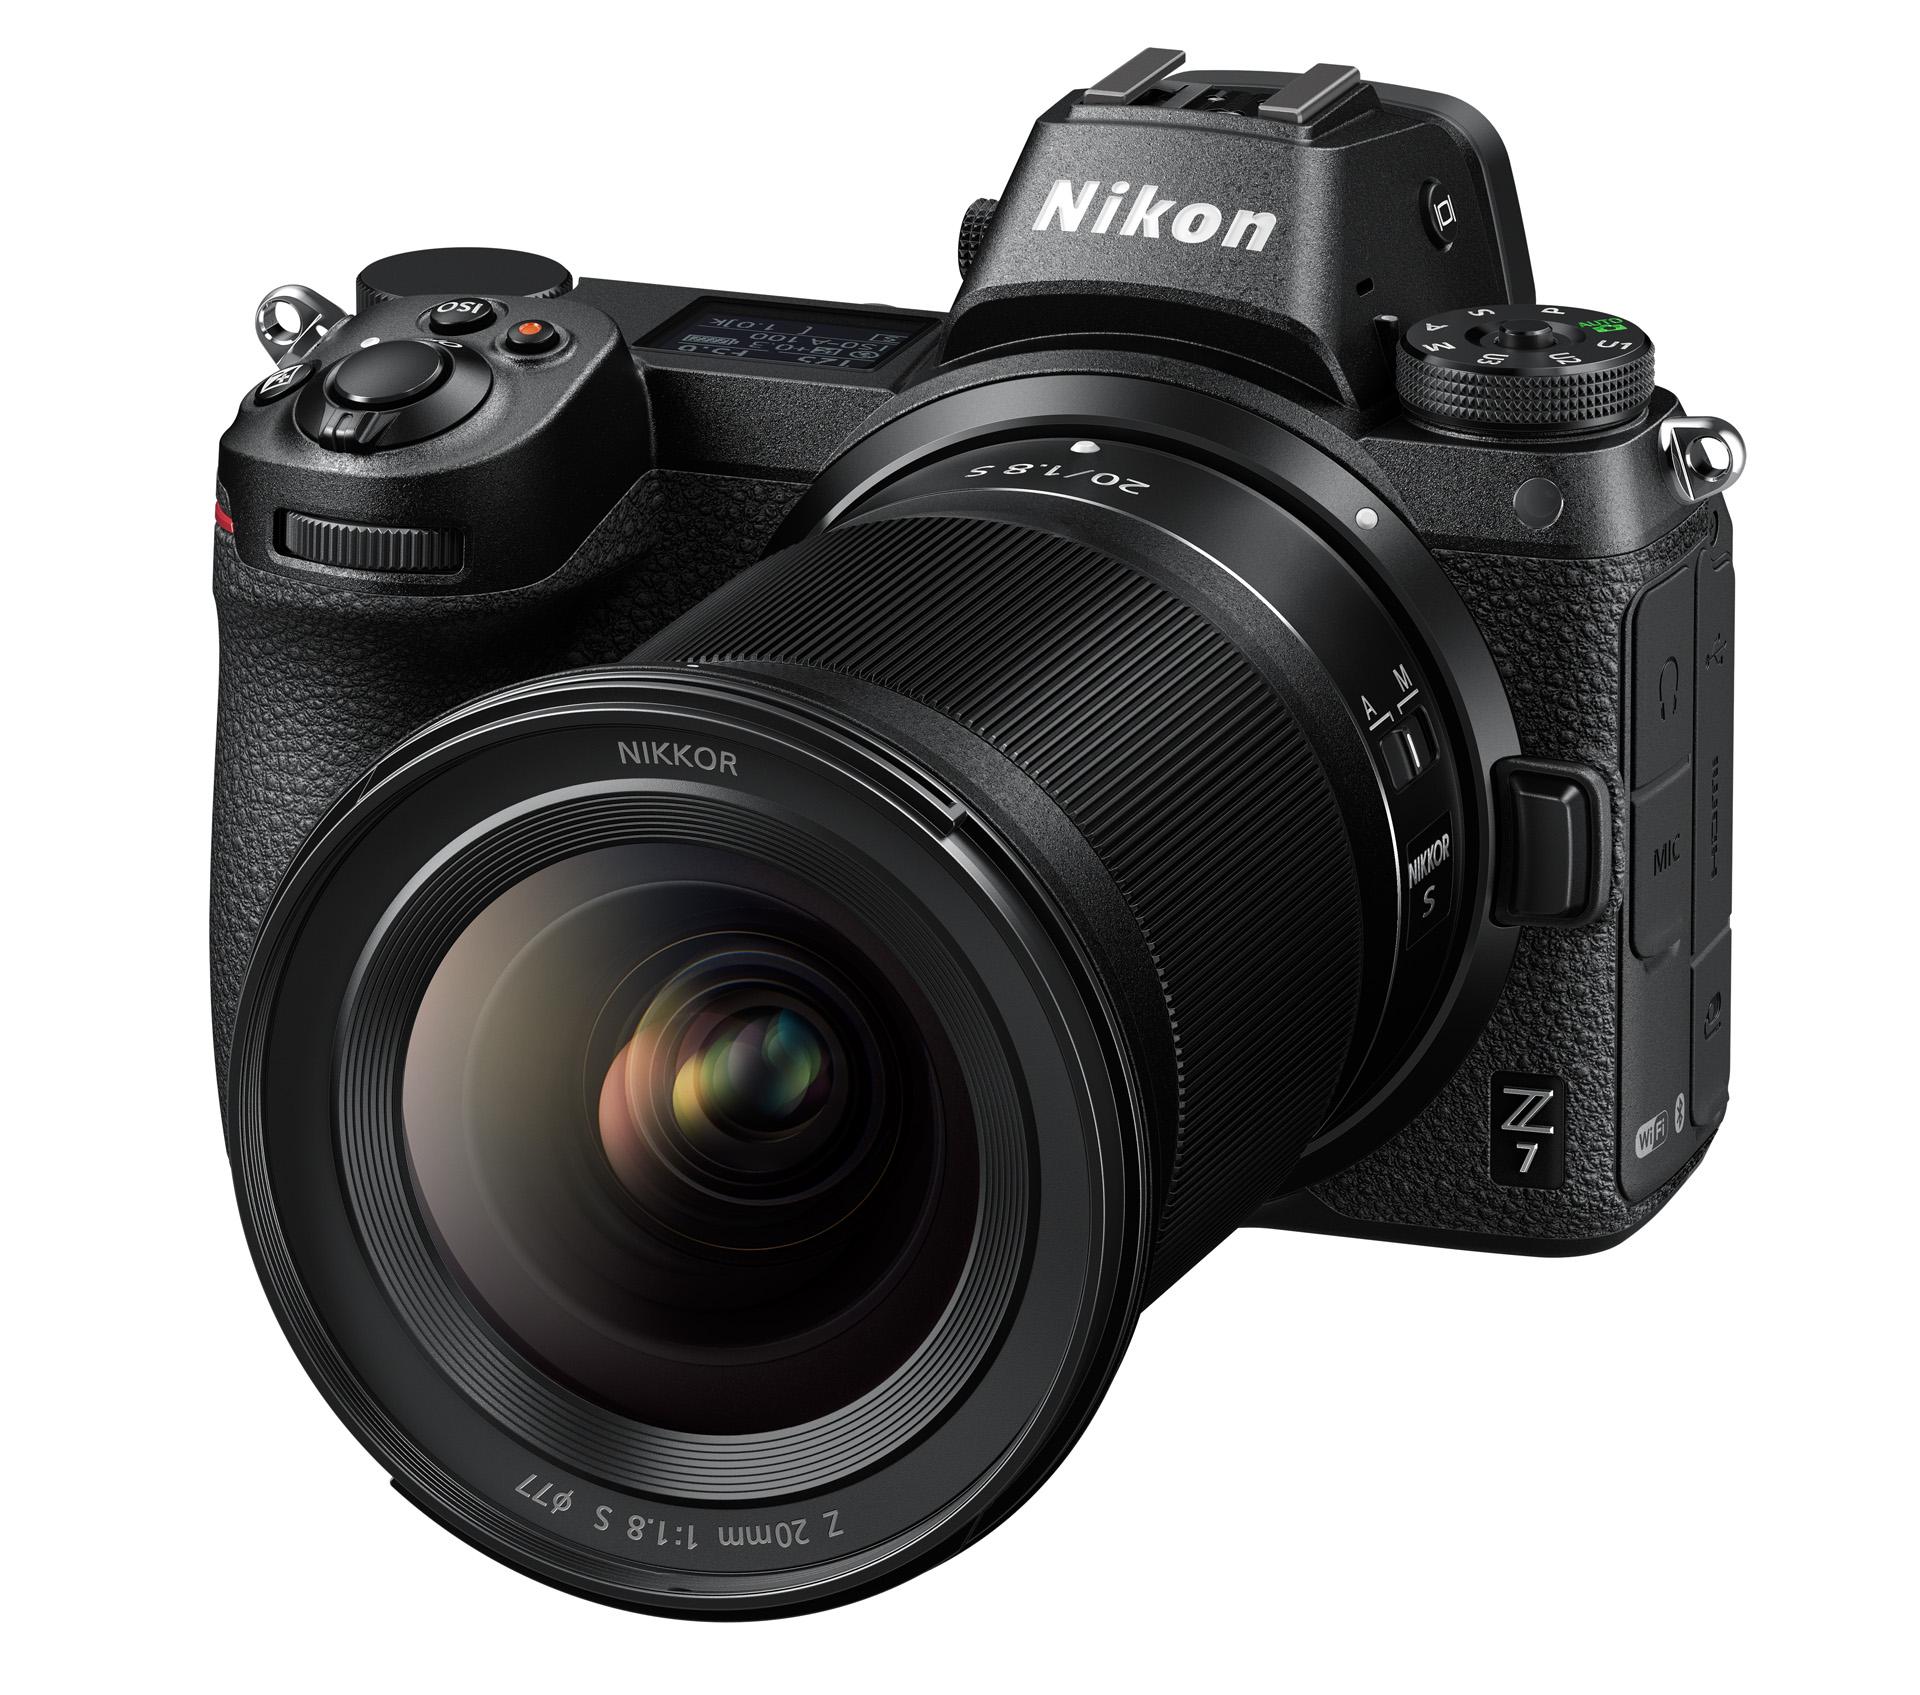 Nikkor Z 20 mm f/1,8 S na těle Nikonu Z 7